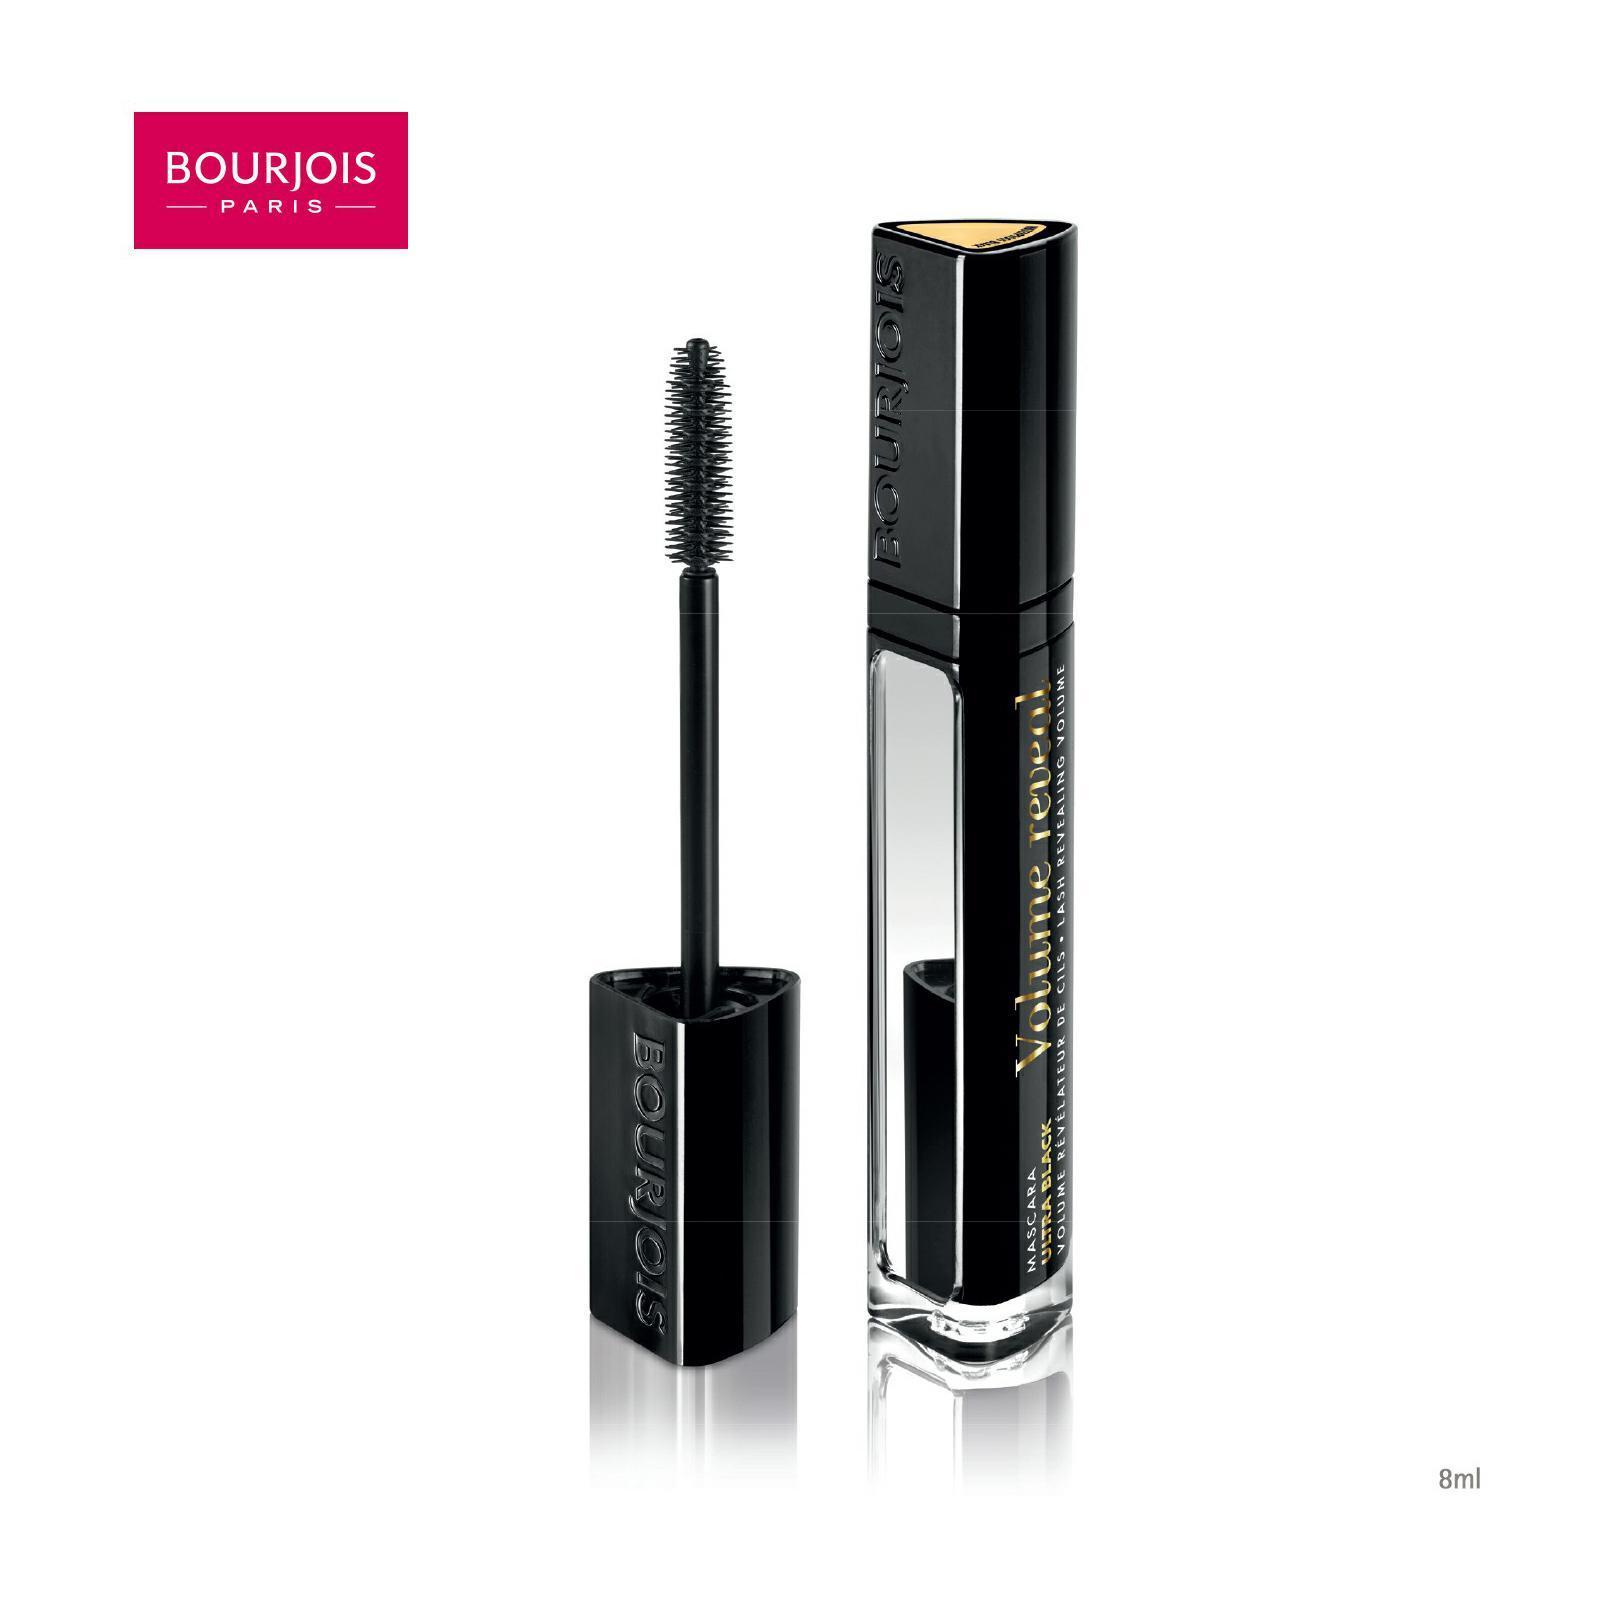 Bourjois Volume Reveal Mascara Ultra Black